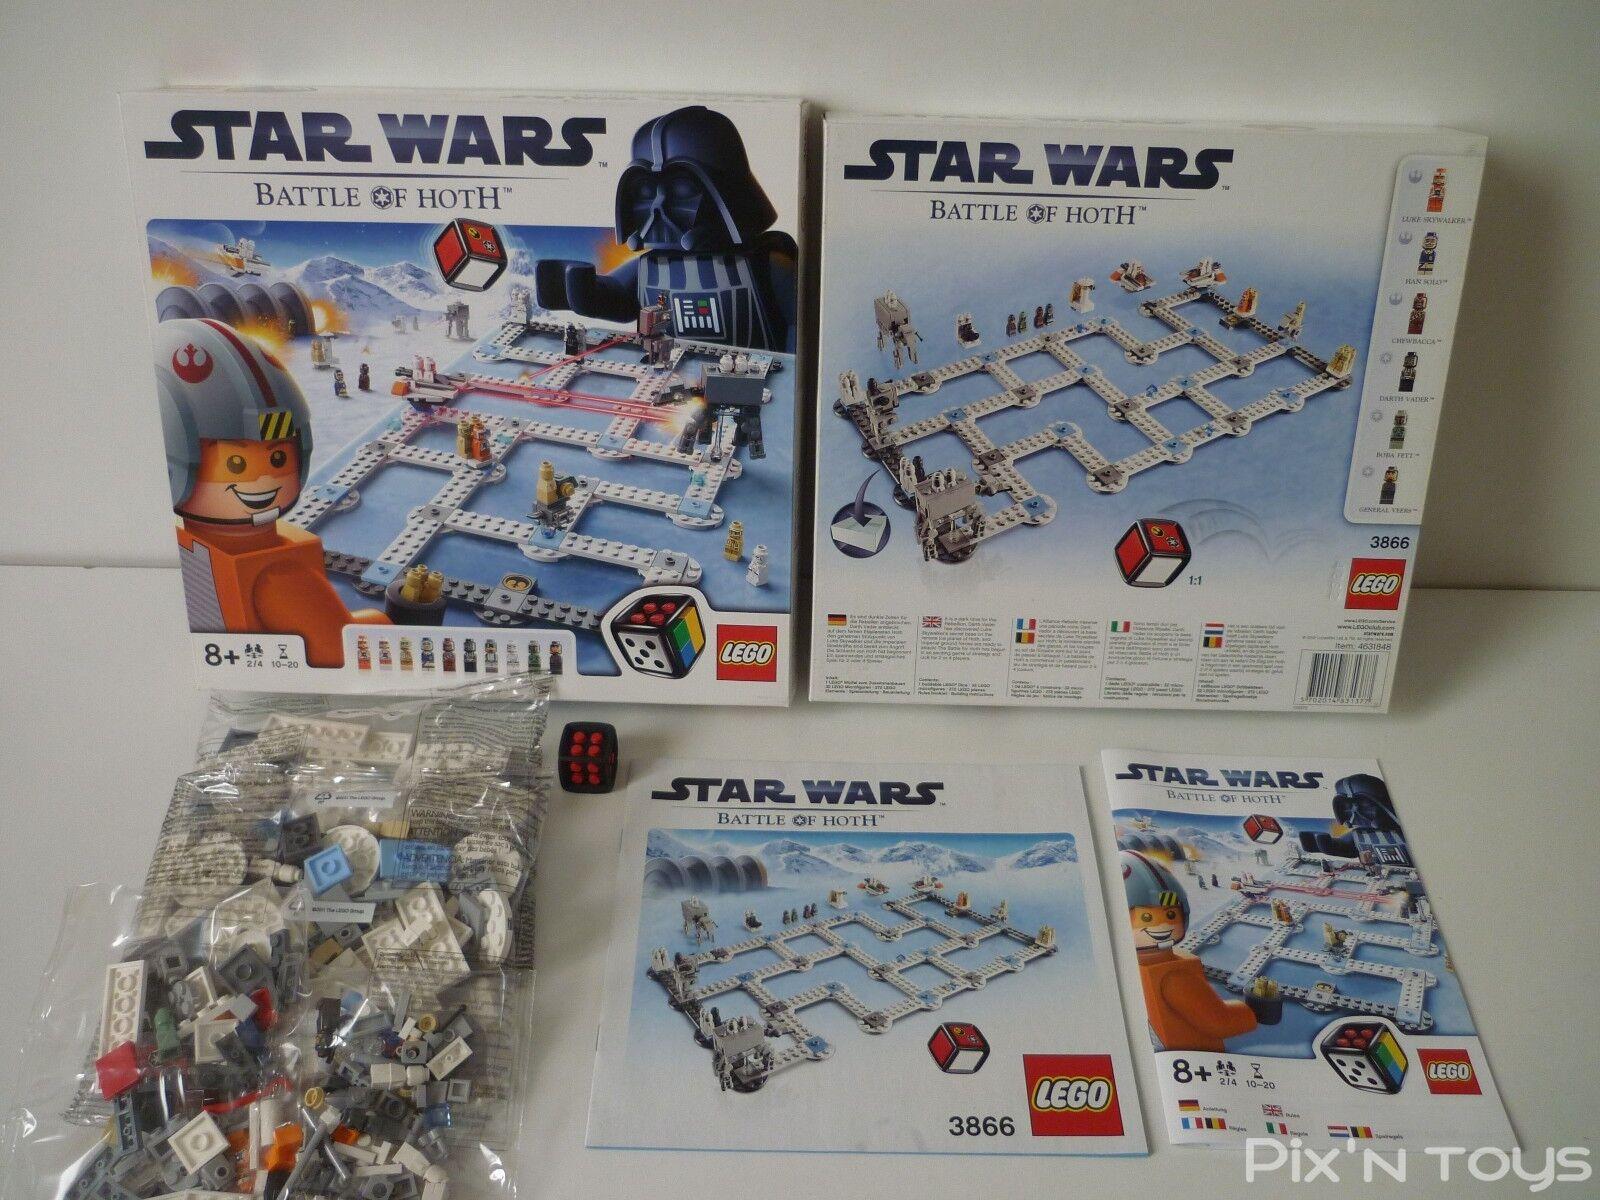 LEGO 3866 Jeu de société Star Wars Battle of Hoth